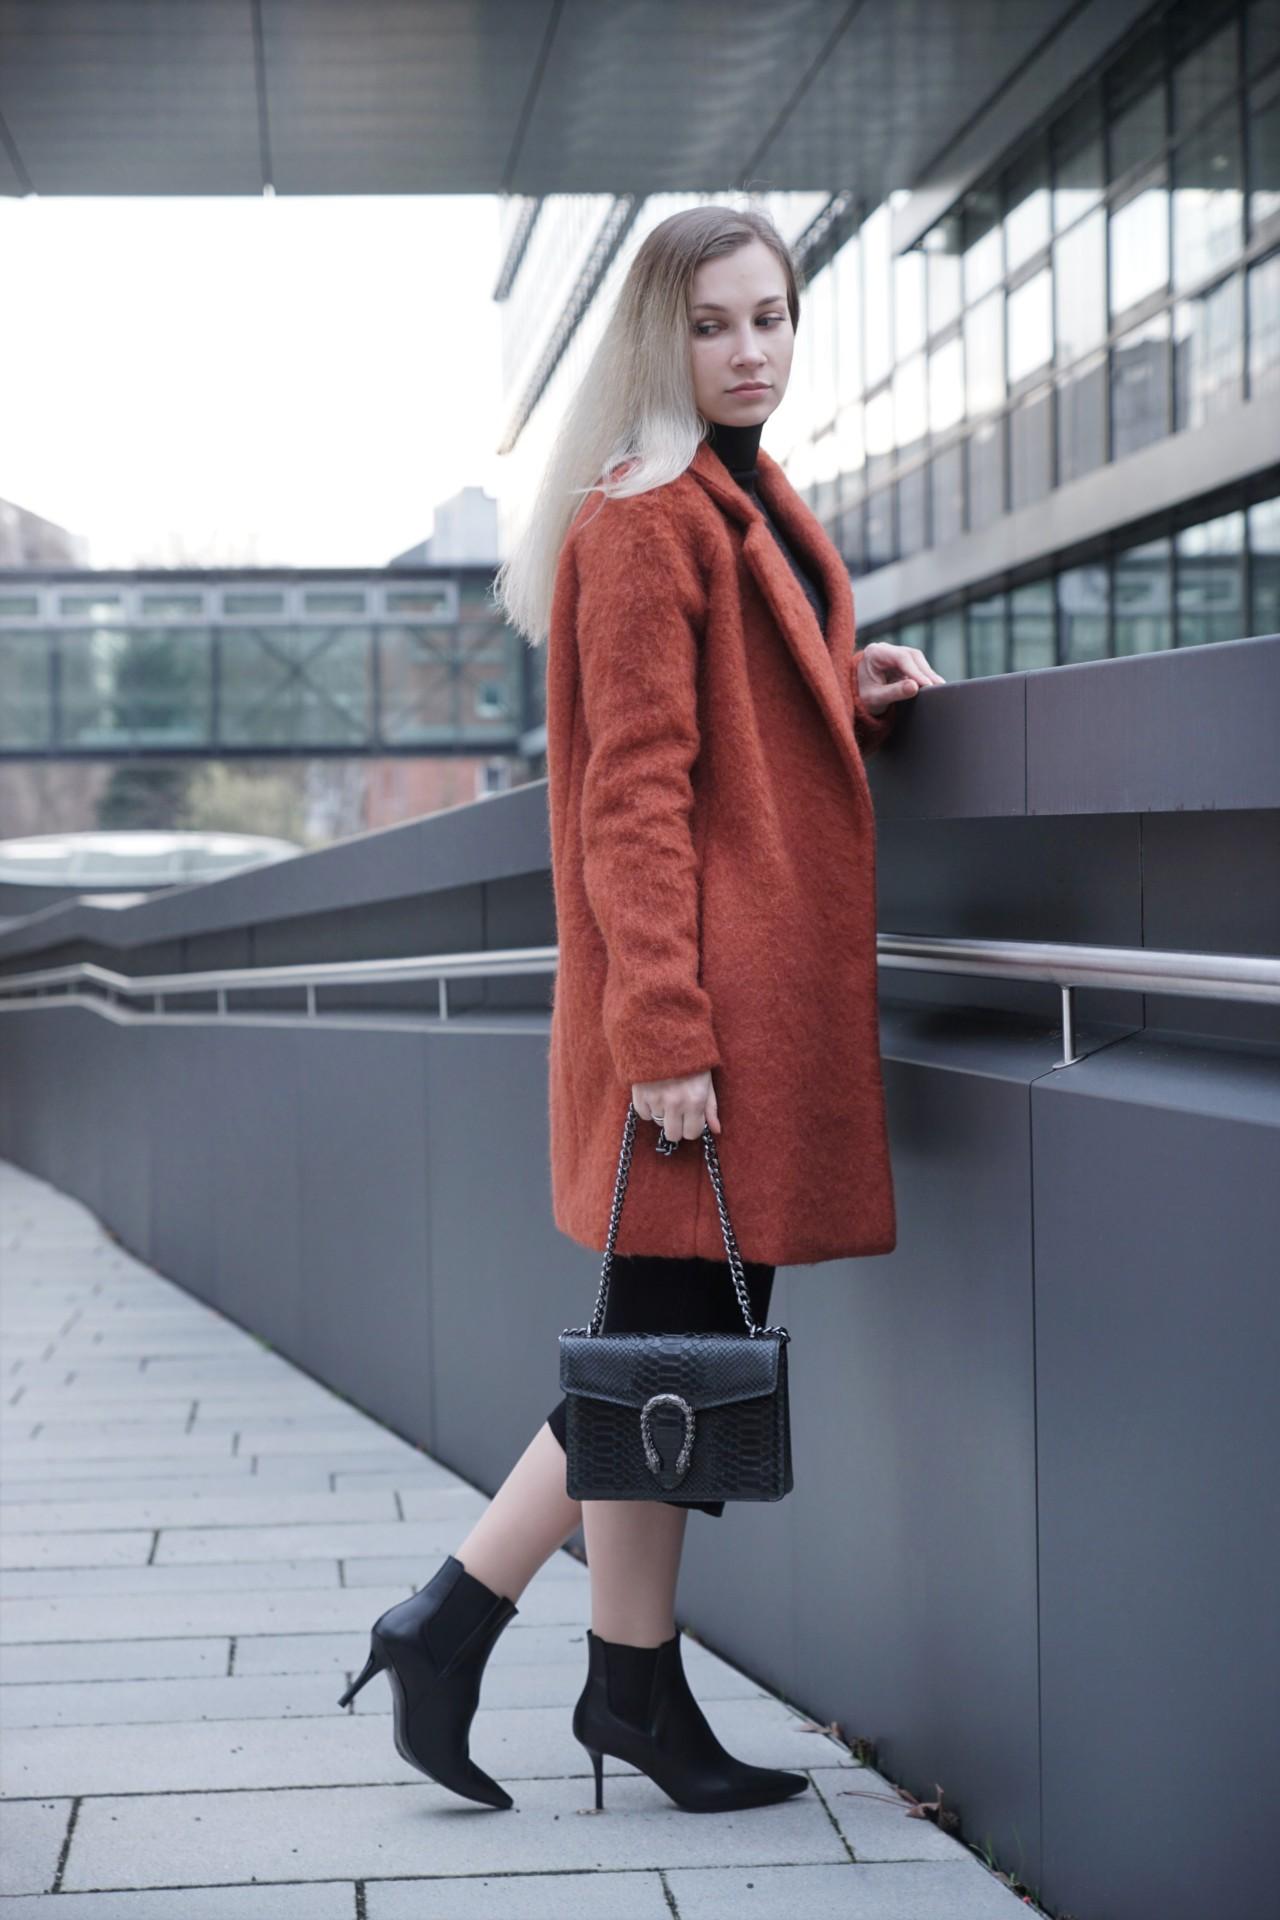 knit_dbkstylez_valentinstag_valentinesday_zara_gucci_toblog_fashionblog